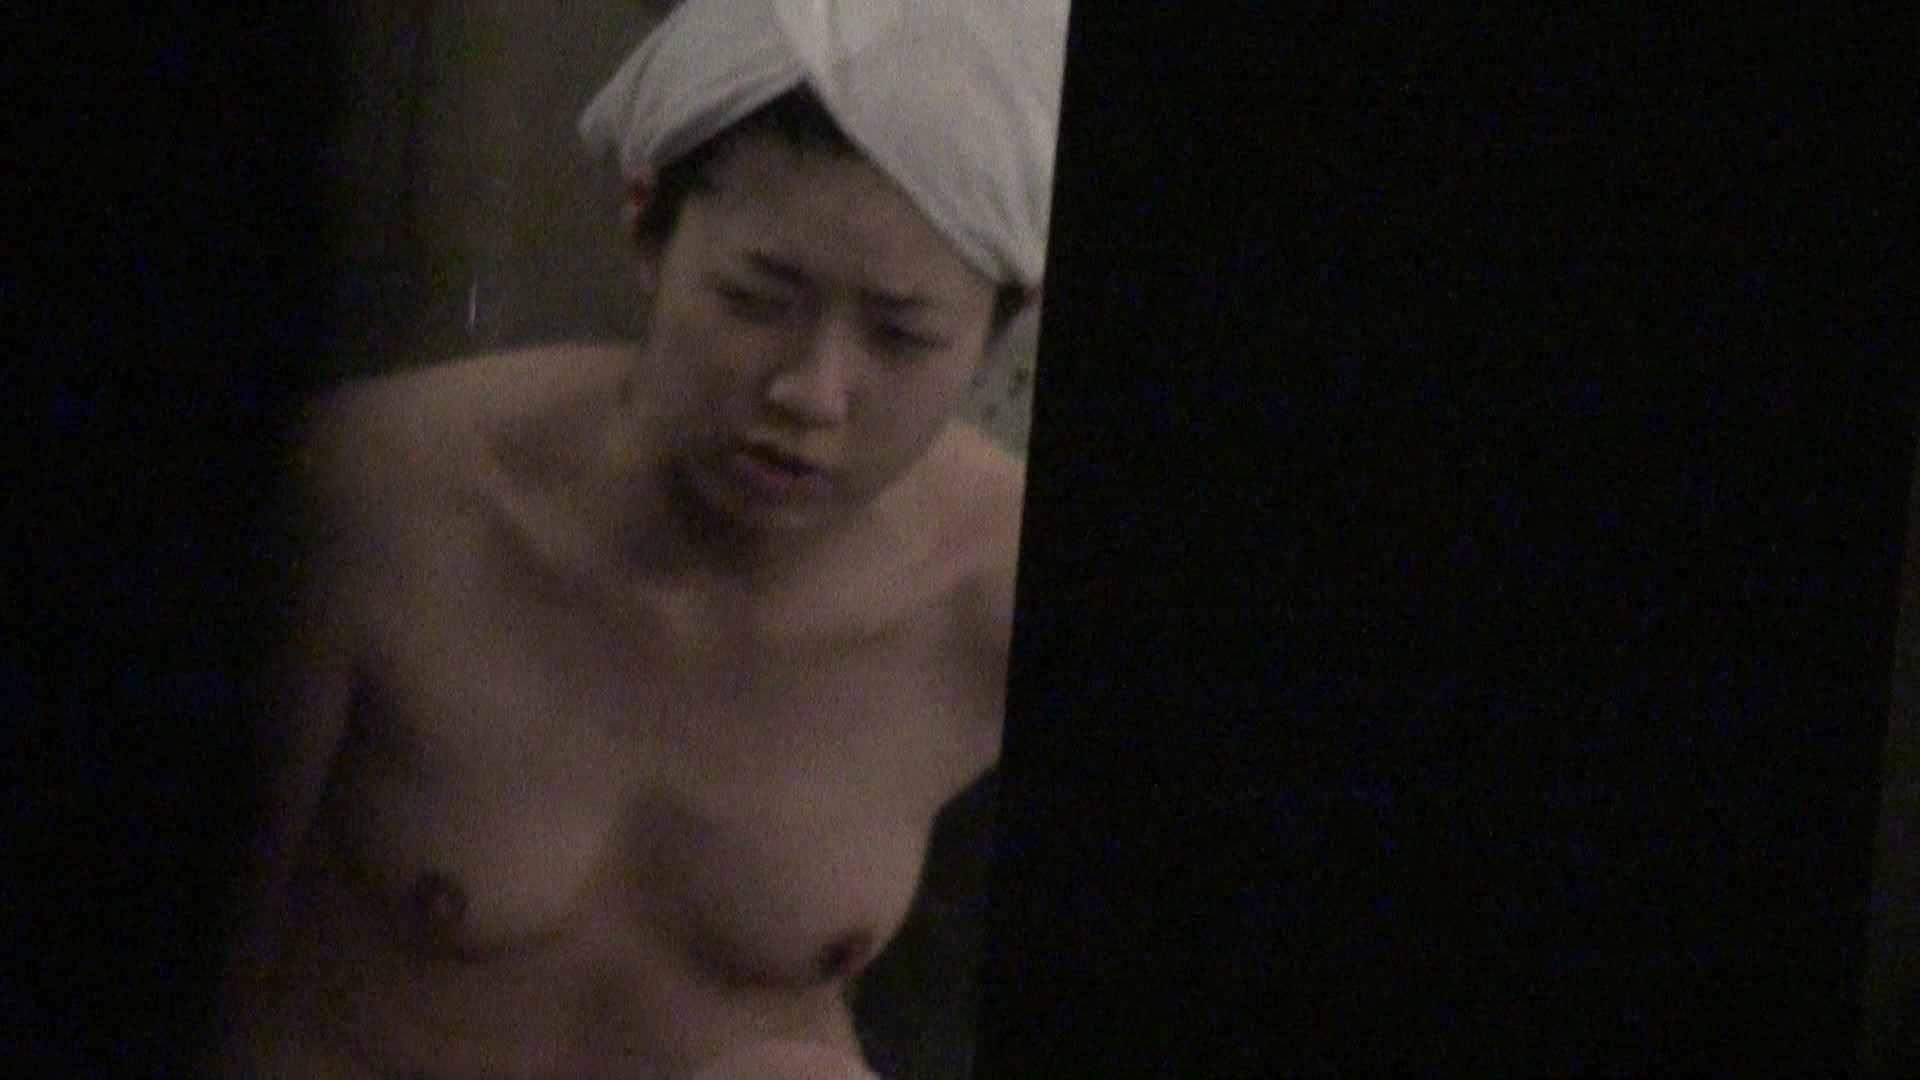 Aquaな露天風呂Vol.401 盗撮大放出 すけべAV動画紹介 60連発 38